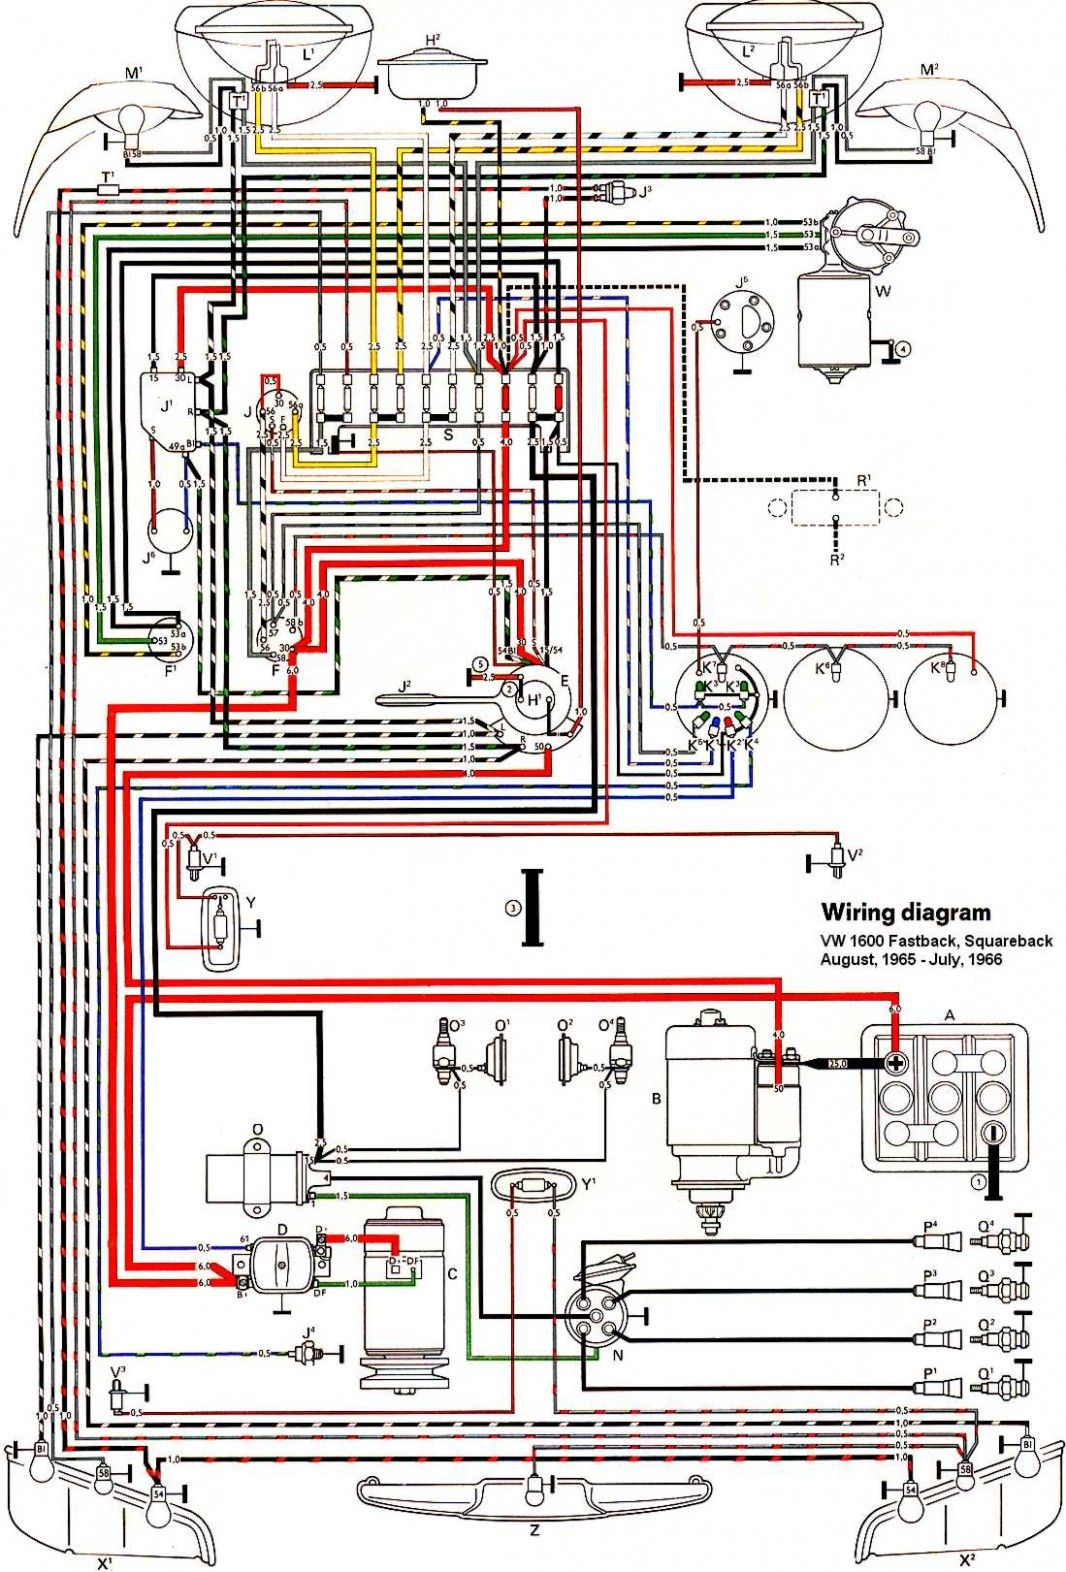 Vw Up Engine Diagram Xl Vw Up Engine Diagram Xl Vw Up Engine